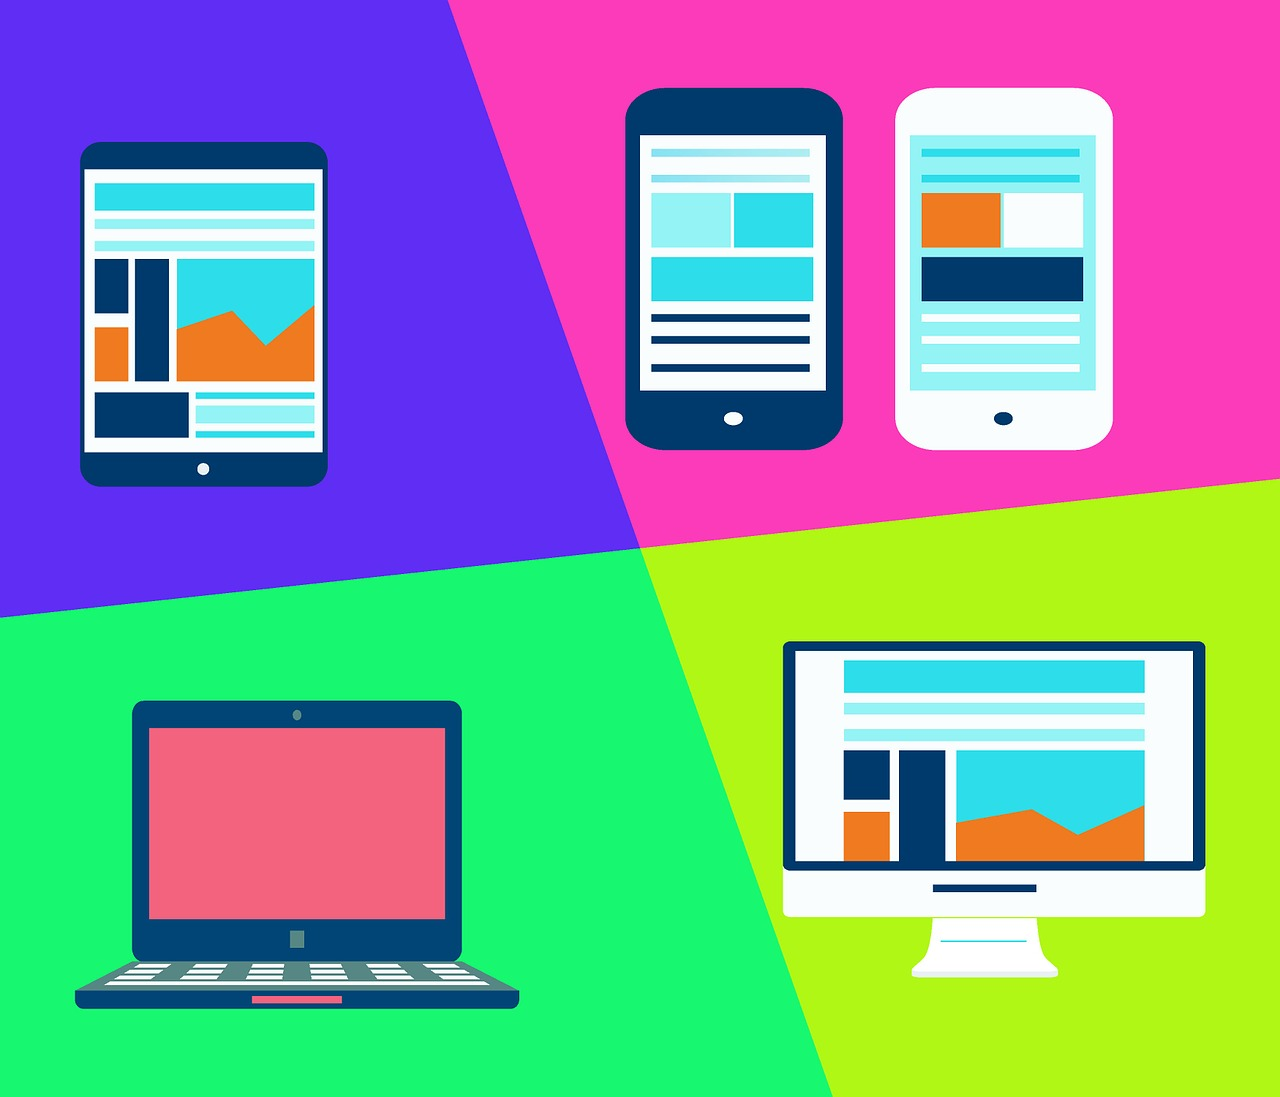 device, mobile, laptop